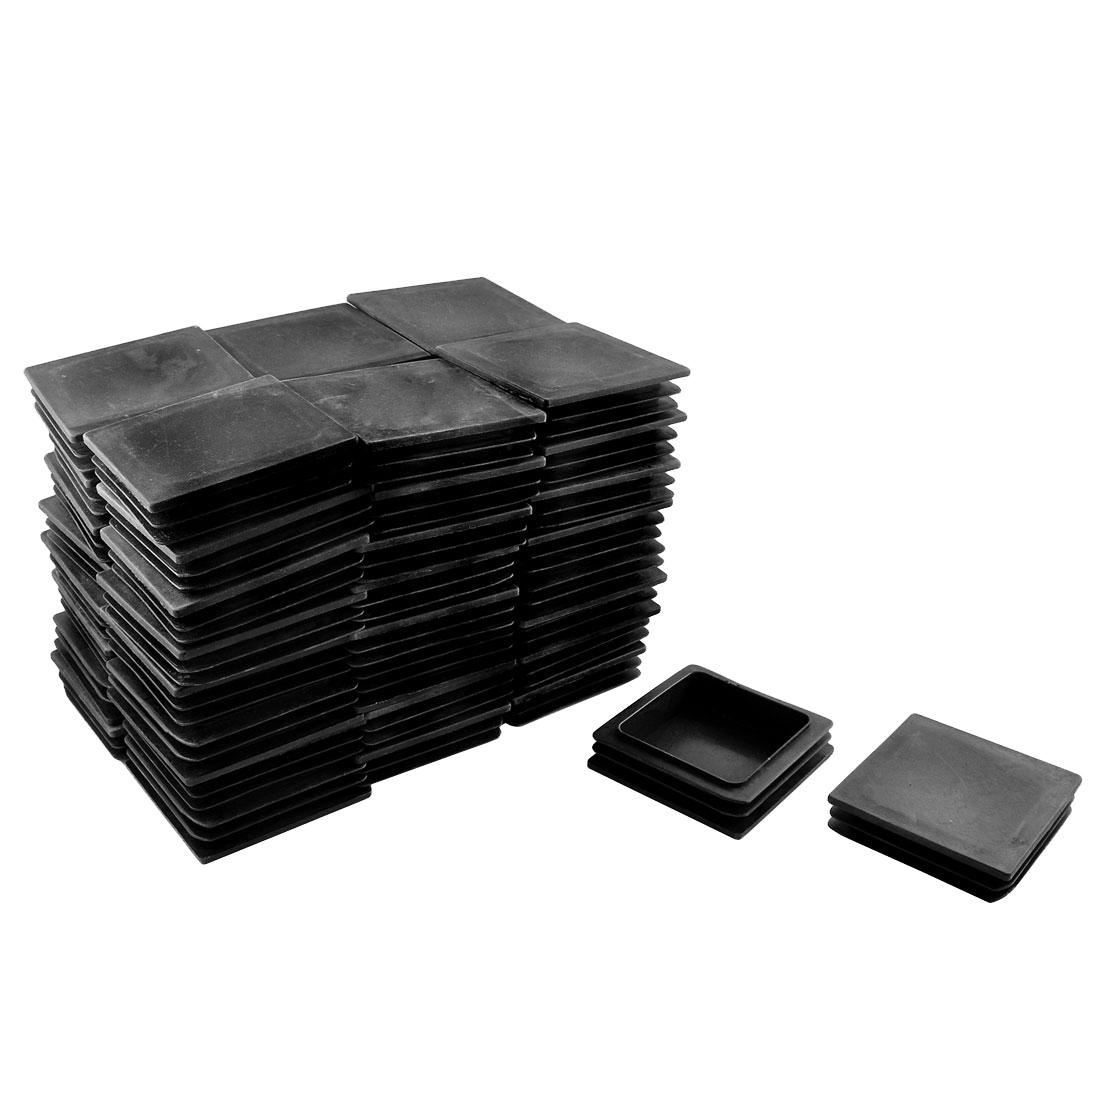 Home School Office Plastic Square Shaped Table Leg Feet Tube Insert Black 50 Pcs